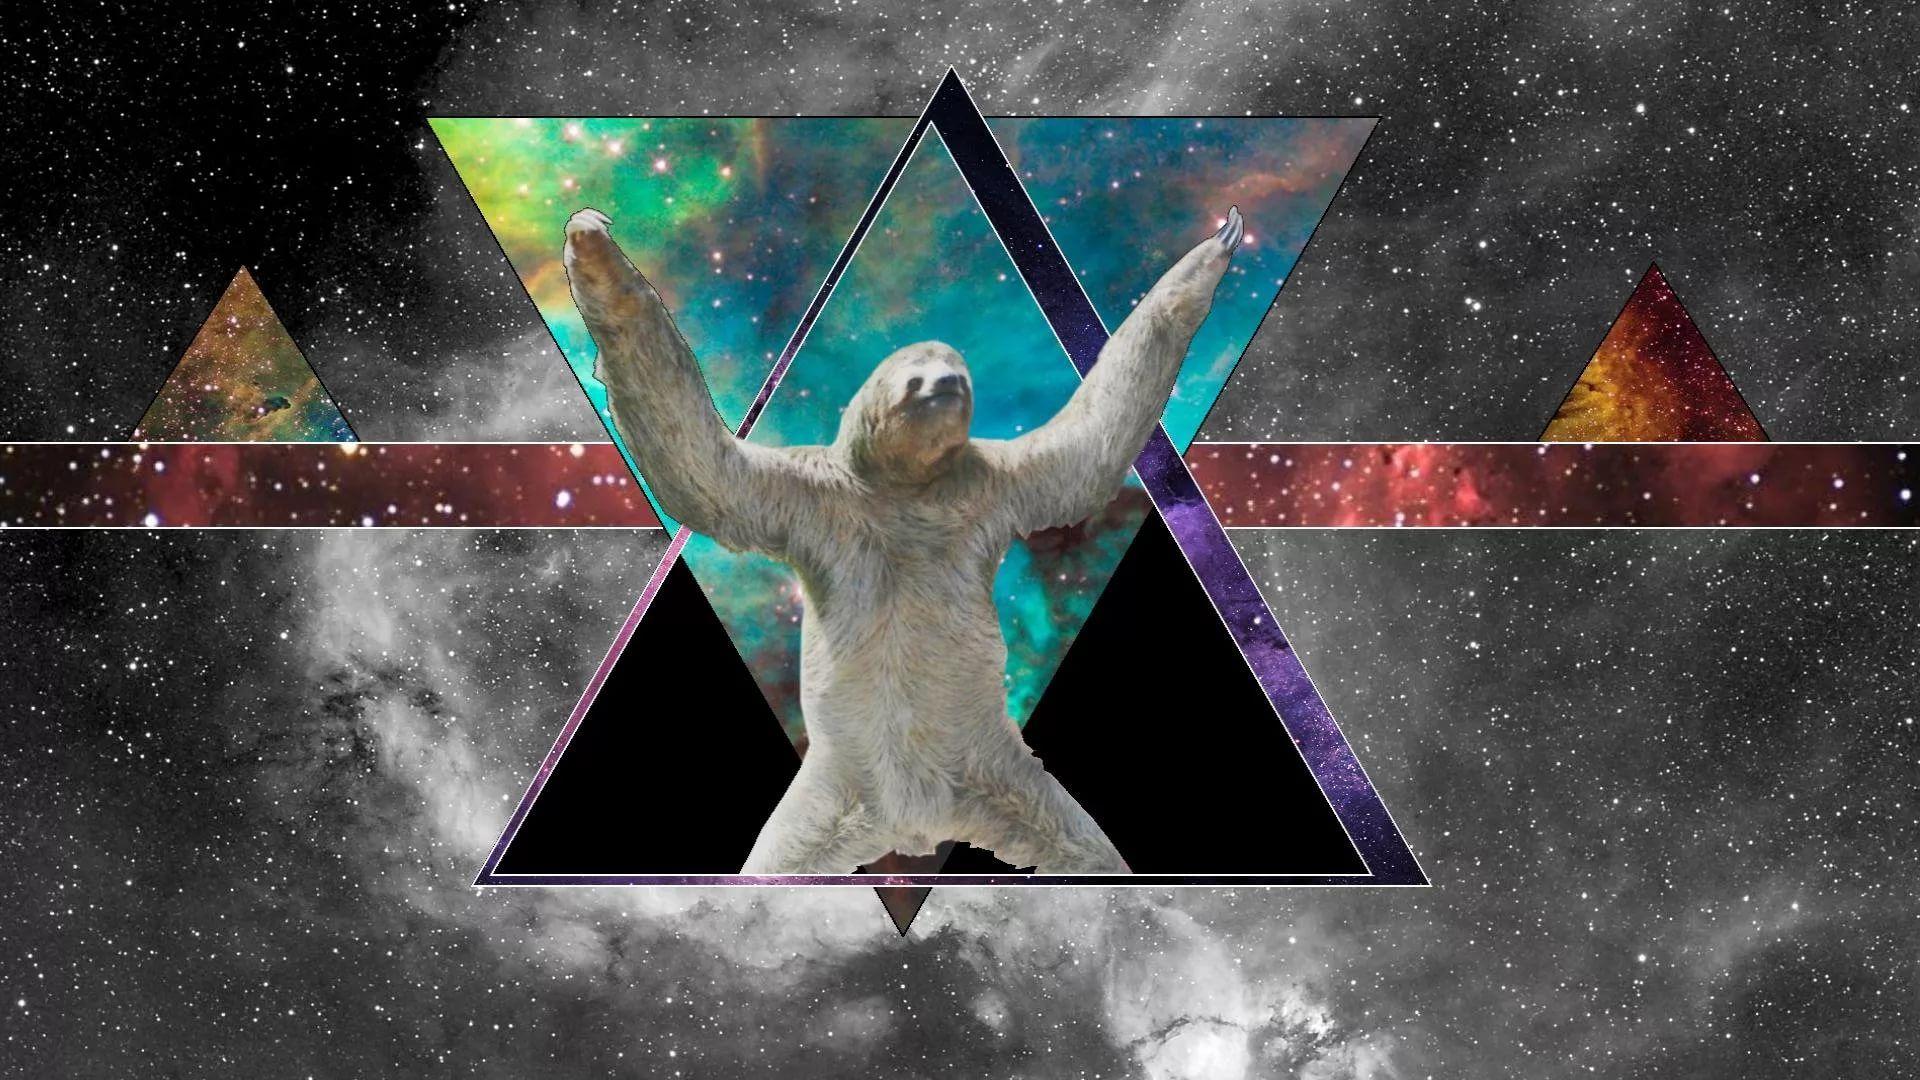 Sloth good wallpaper hd